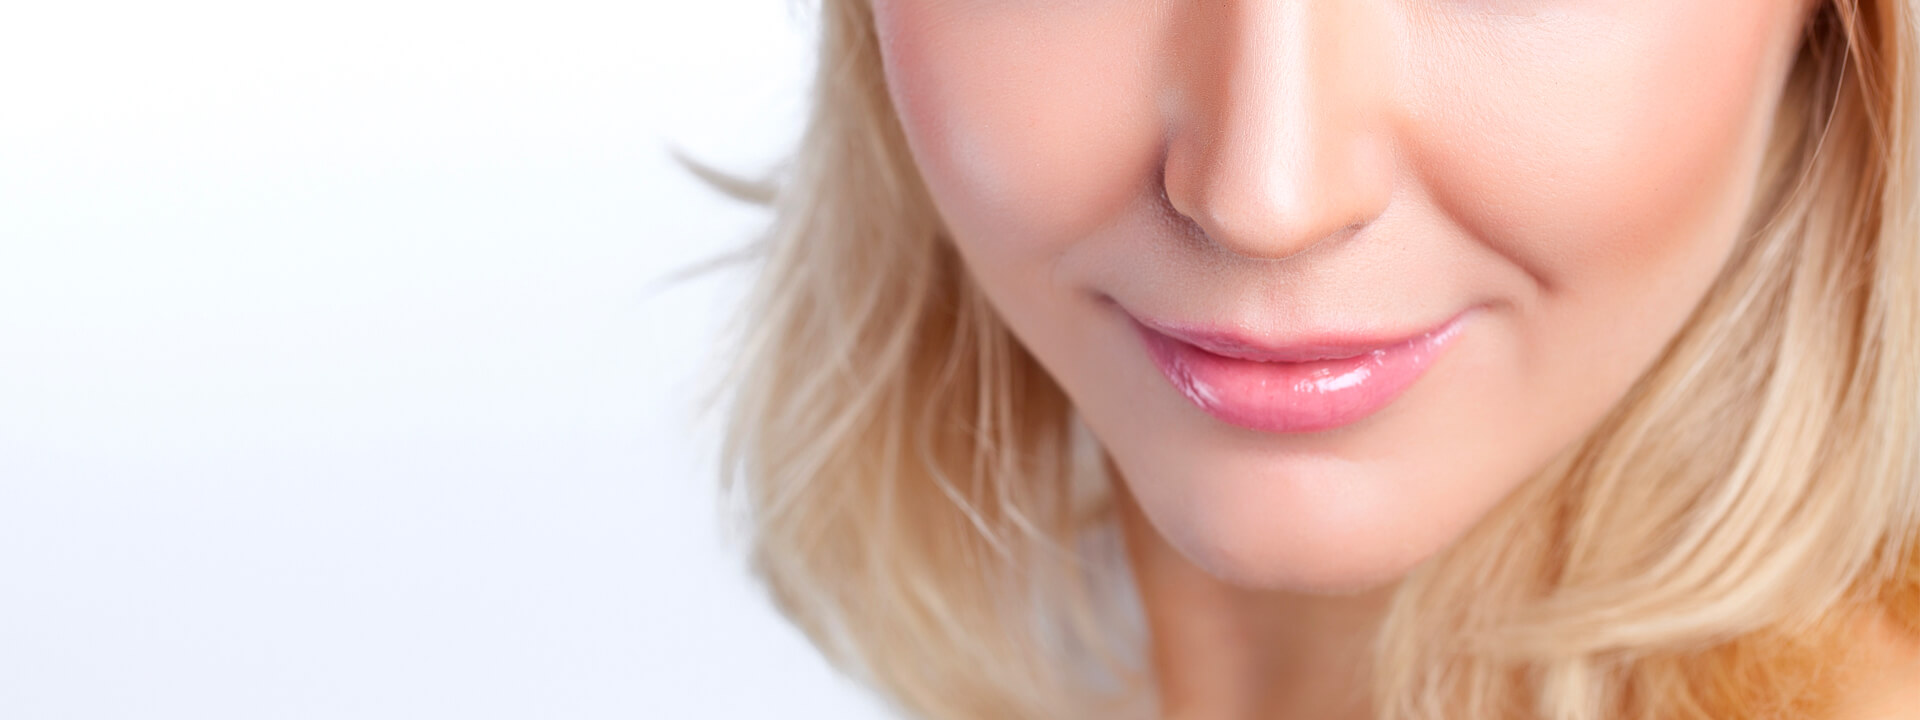 Melasma hyperpigmentation